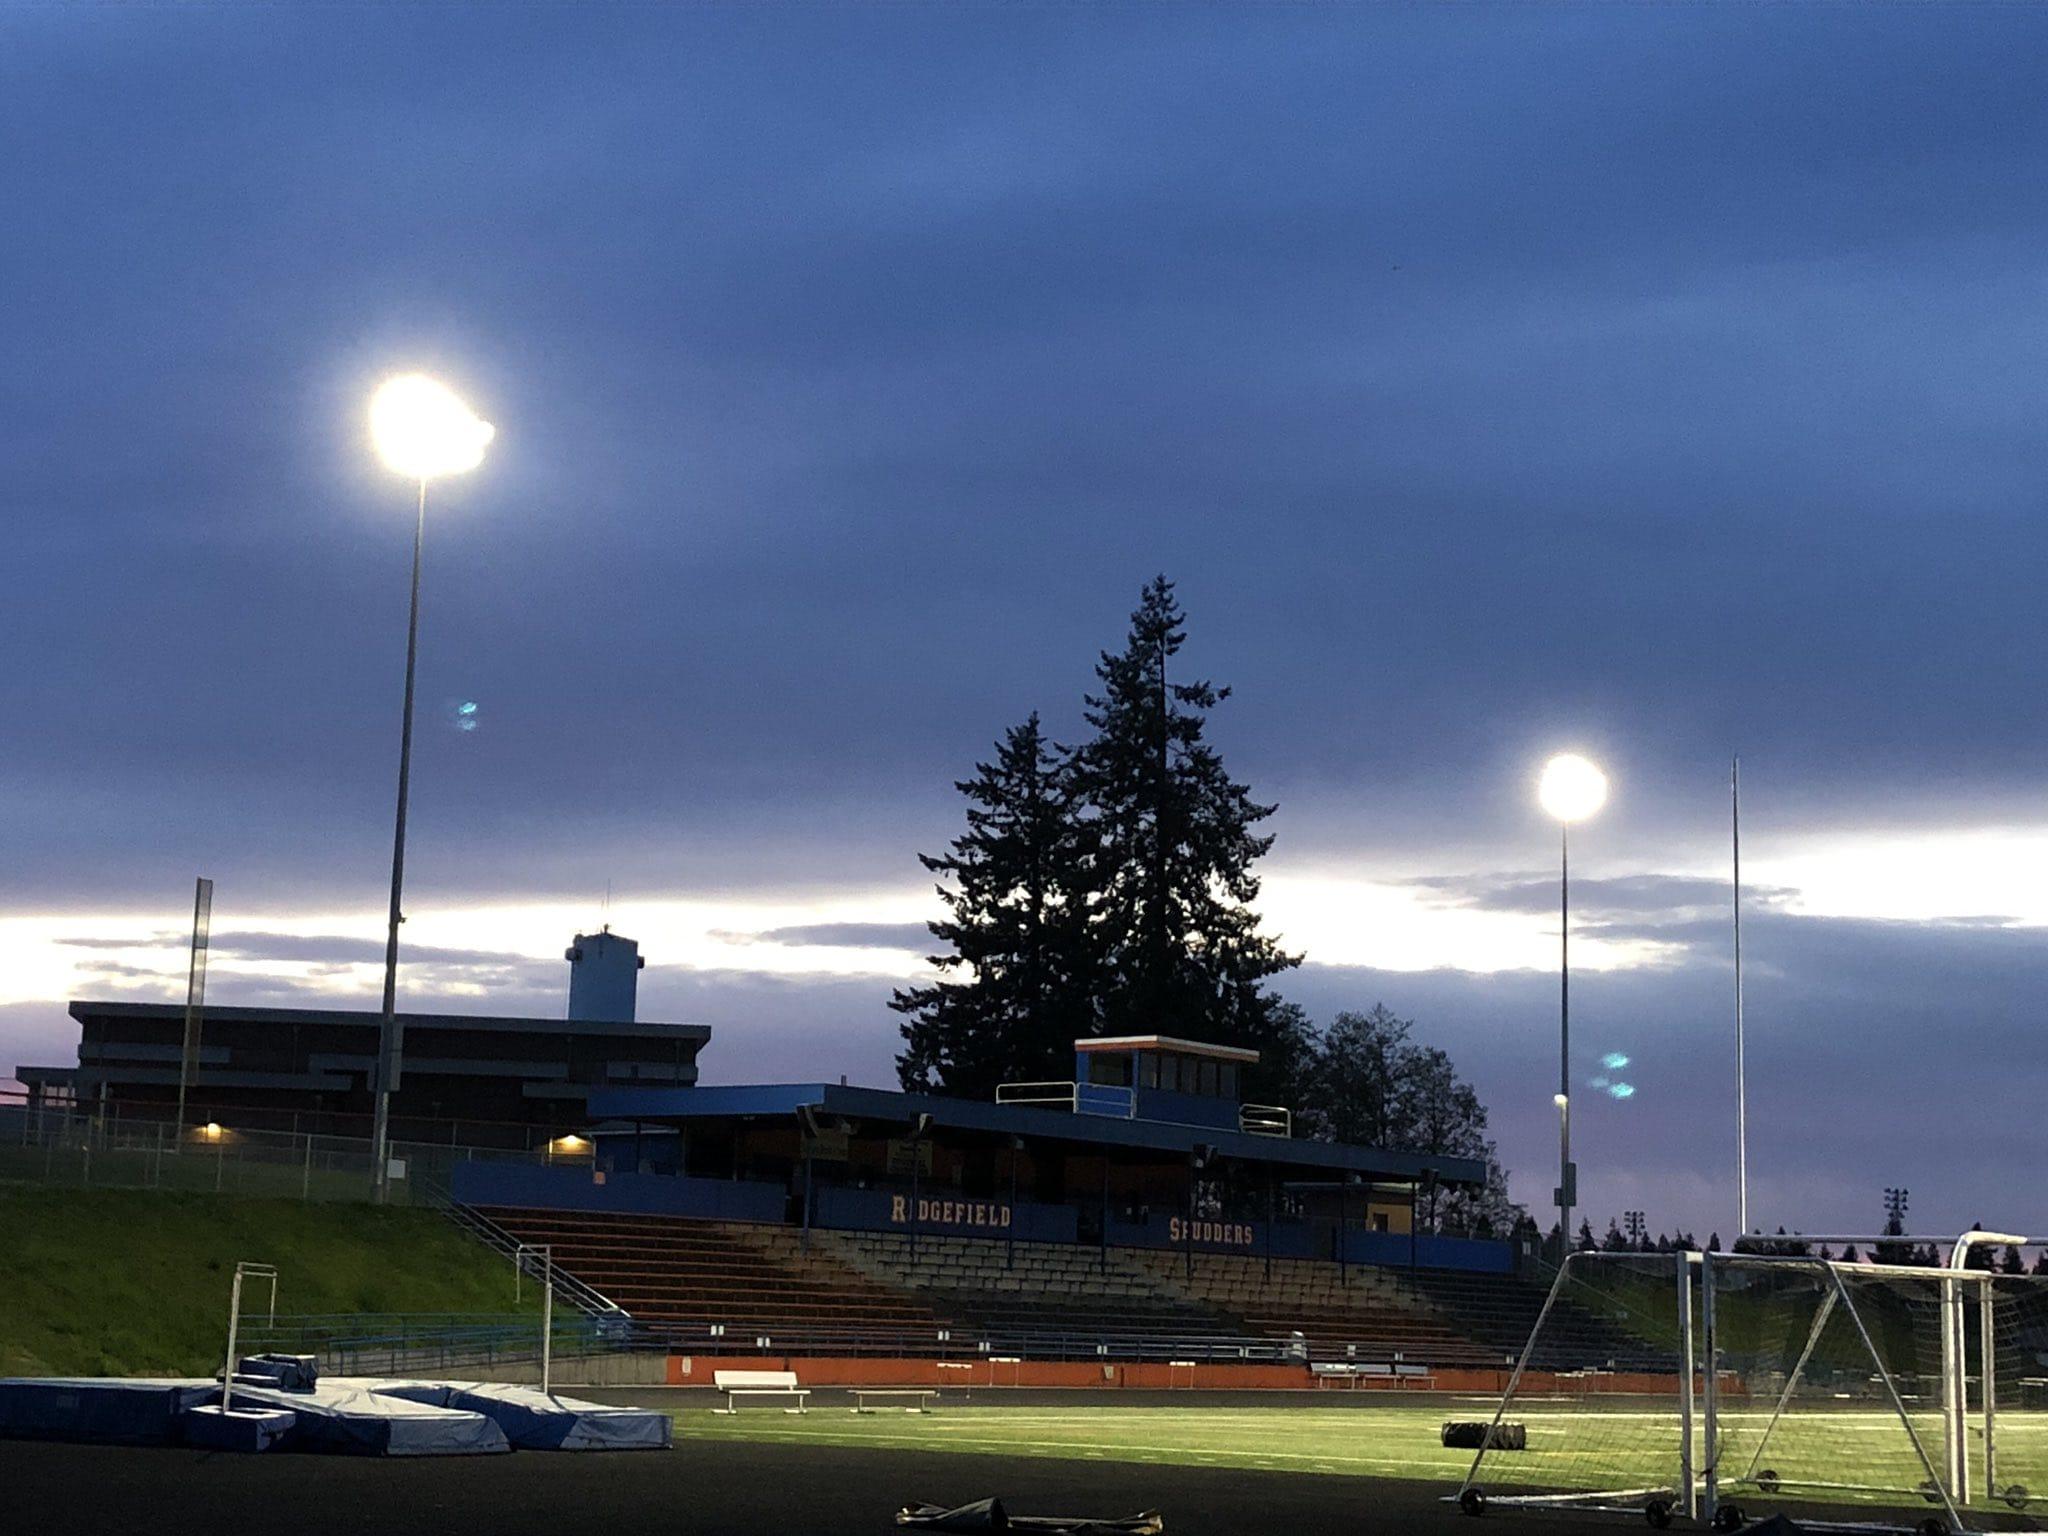 The lights shine on Ridgefield High School stadium on #BeTheLight night on Friday (Micah Rice/The Columbian)